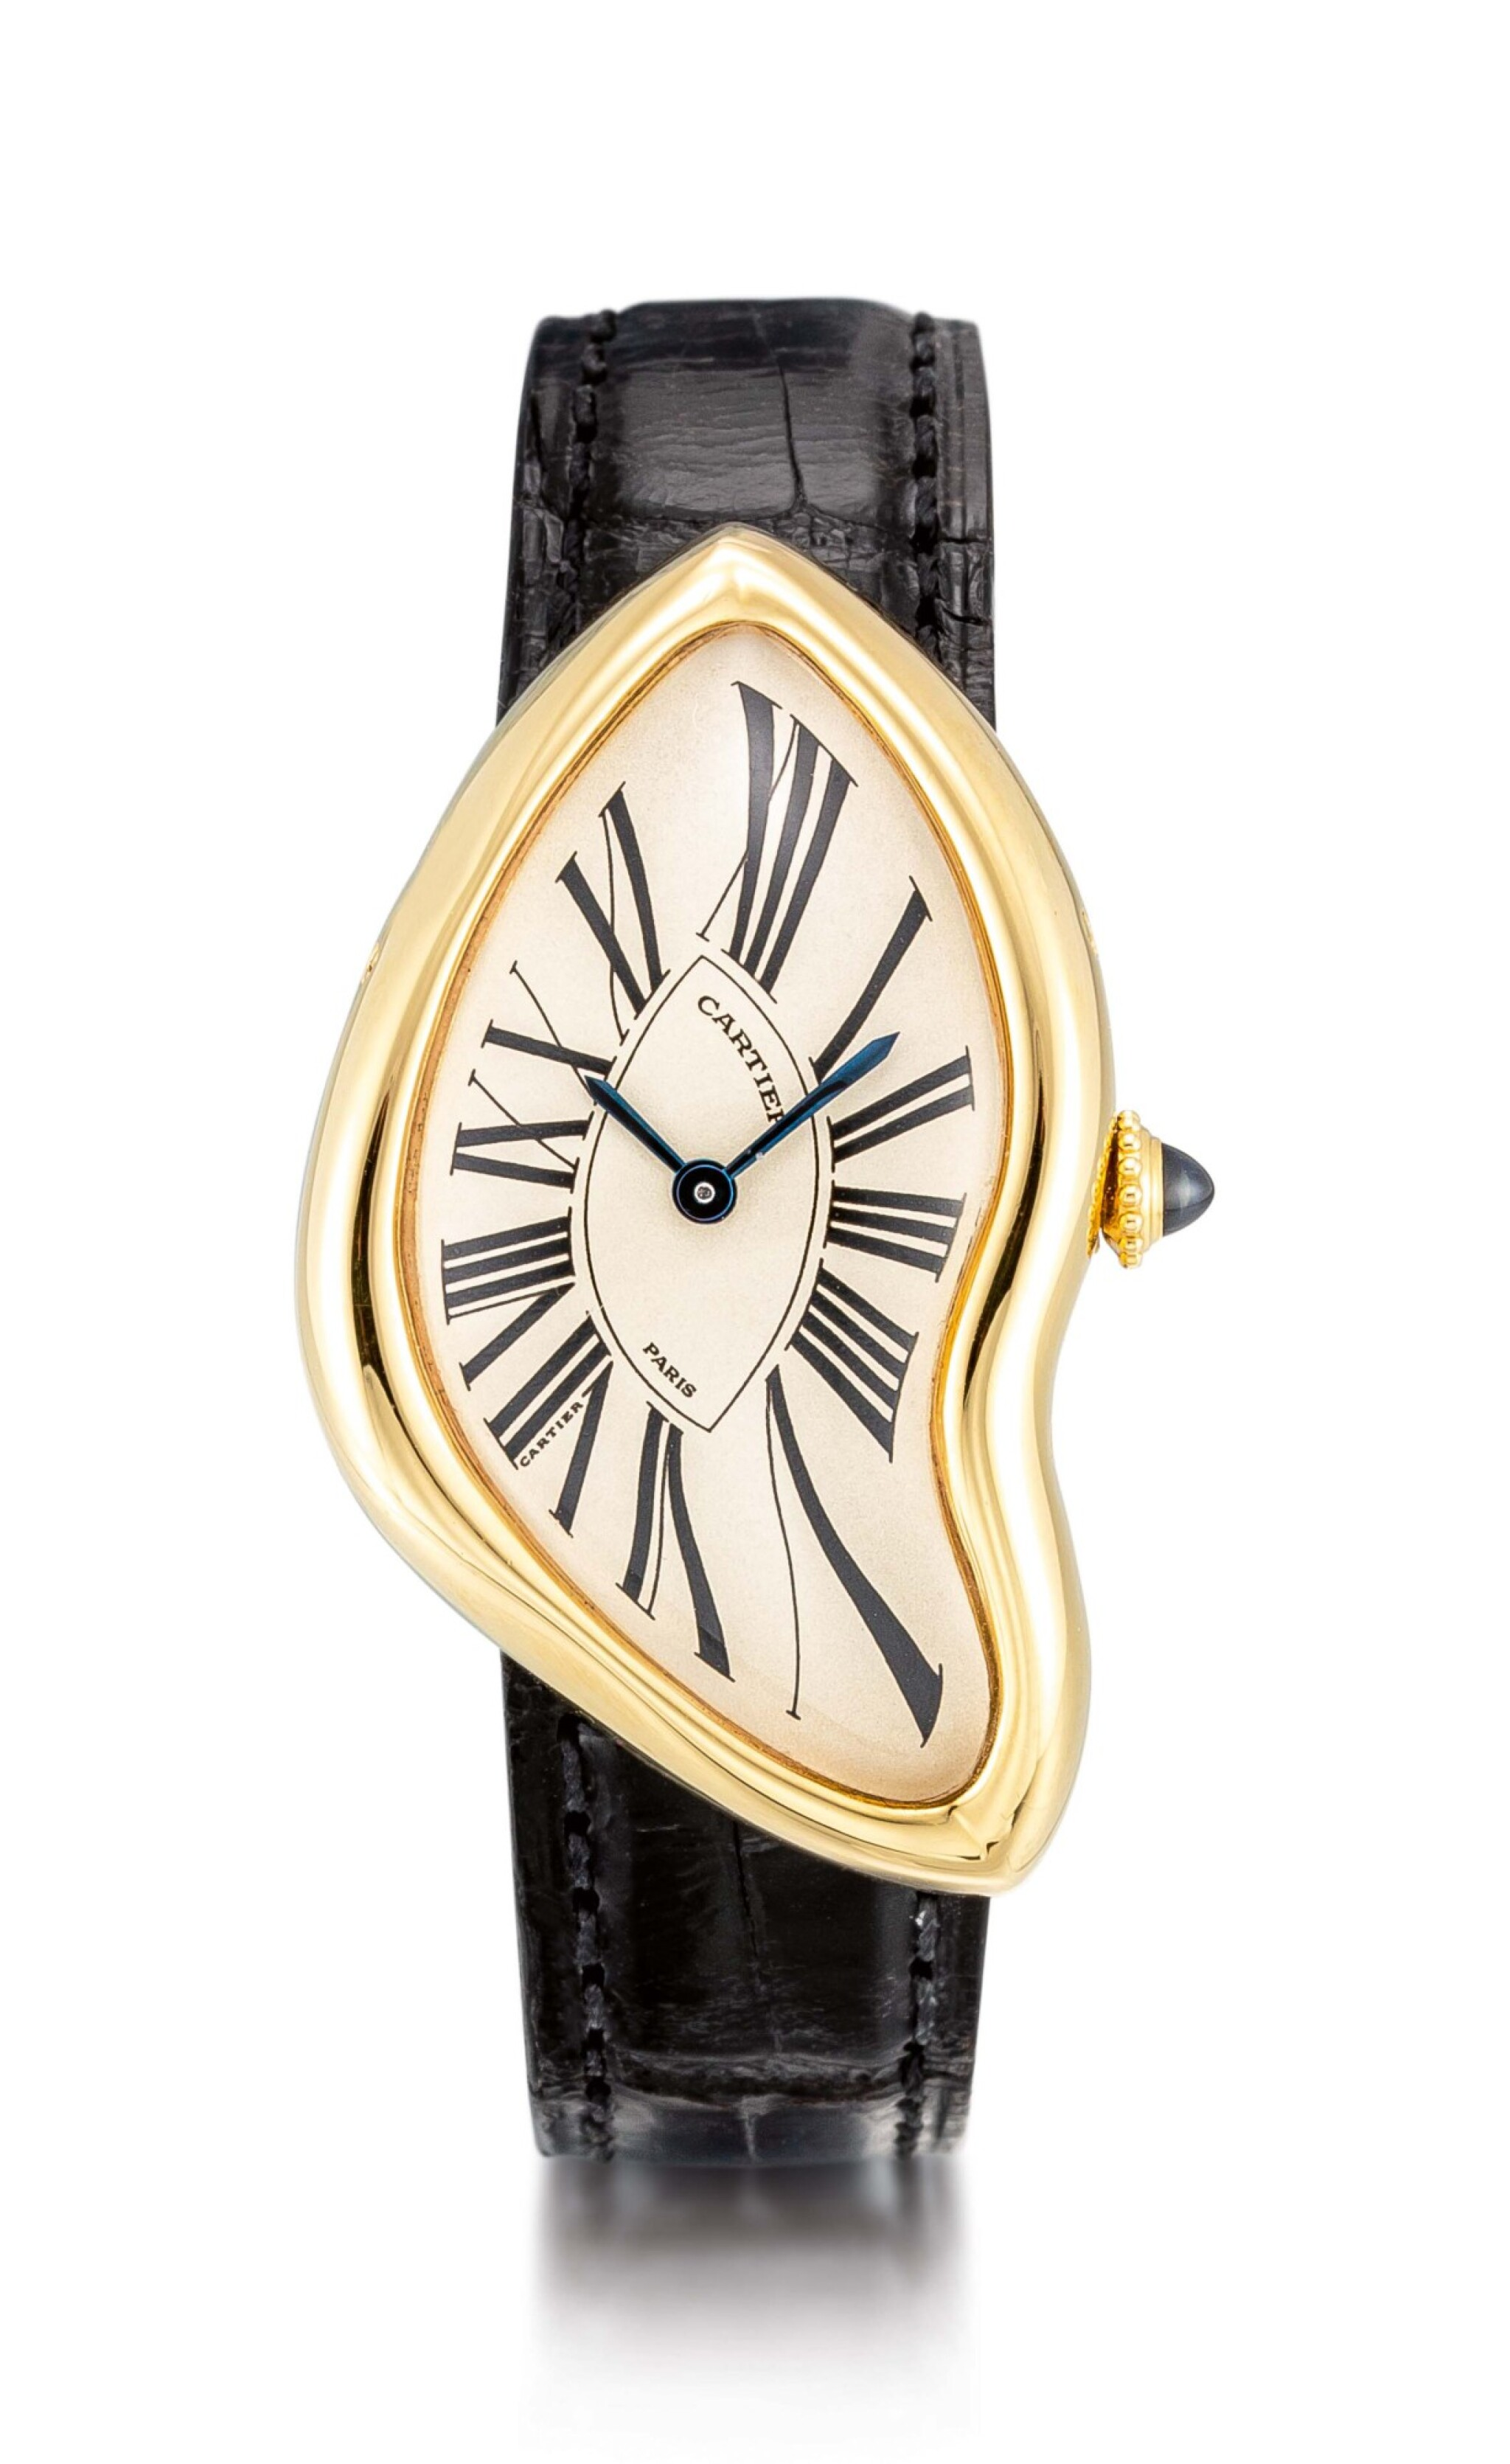 View full screen - View 1 of Lot 8002. Cartier   Crash, A yellow gold wristwatch, Circa 1991   卡地亞   Crash 黃金腕錶,約1991年製.